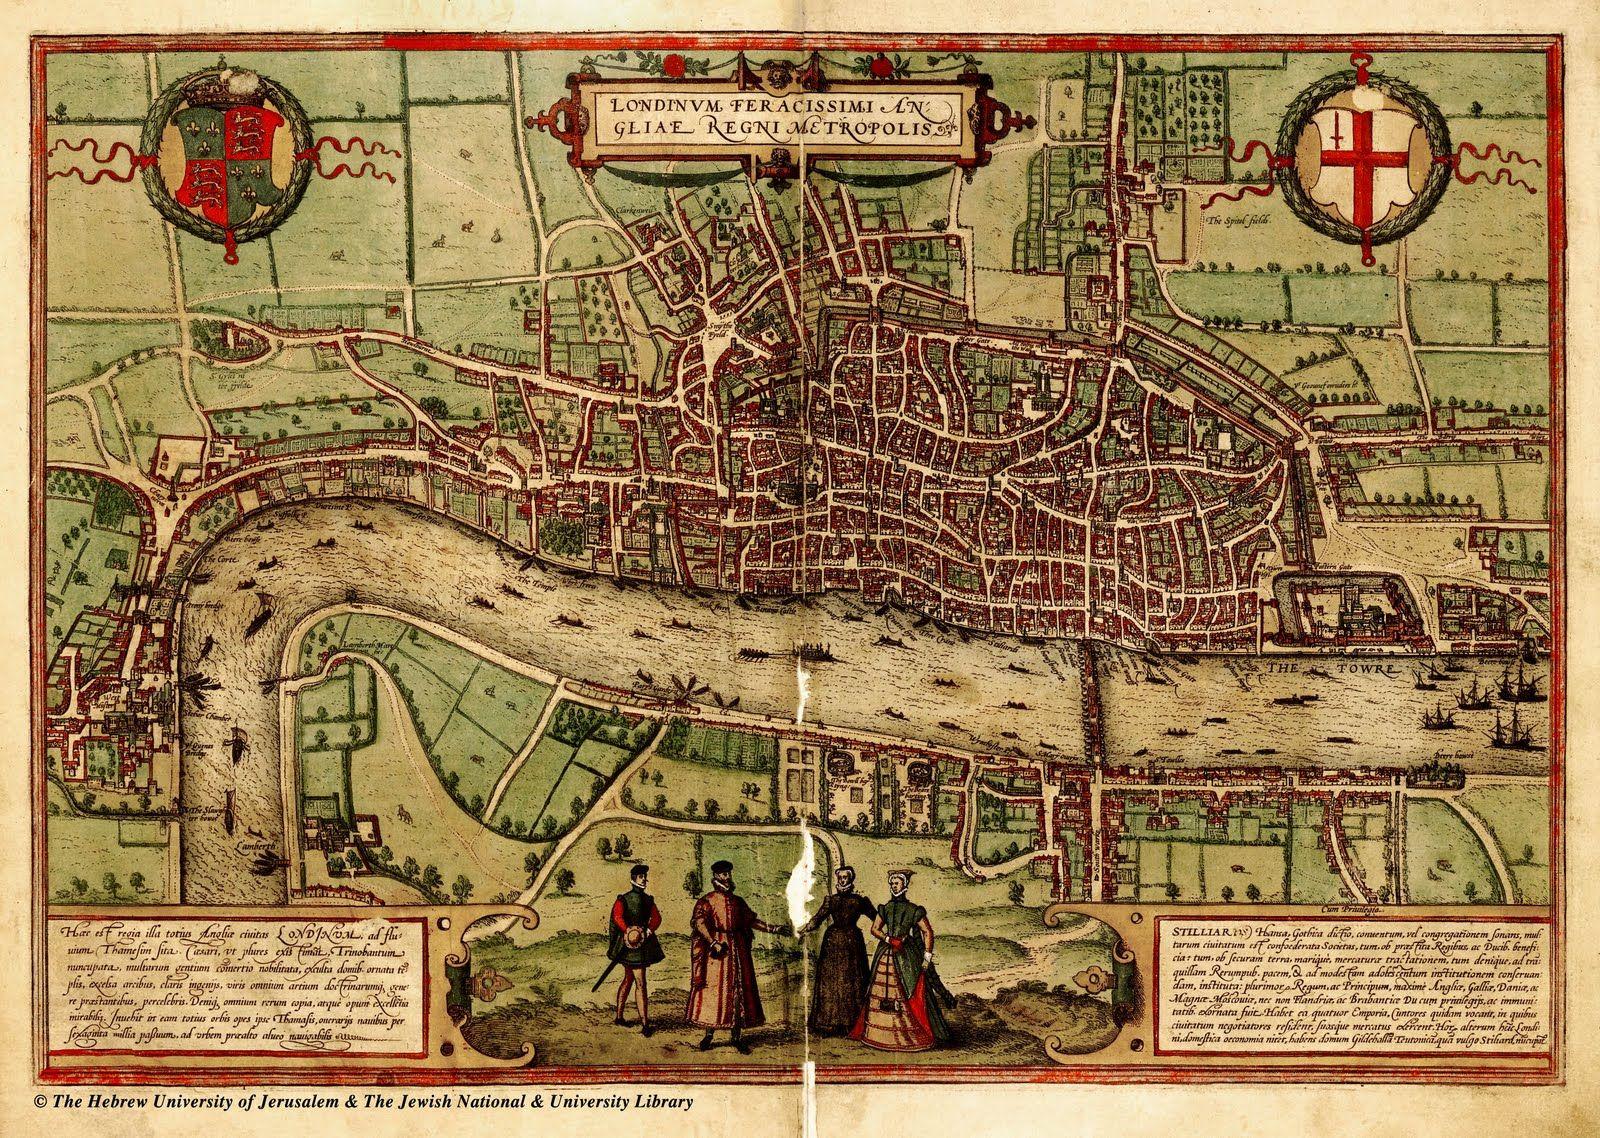 London 16th century | history&mideavil